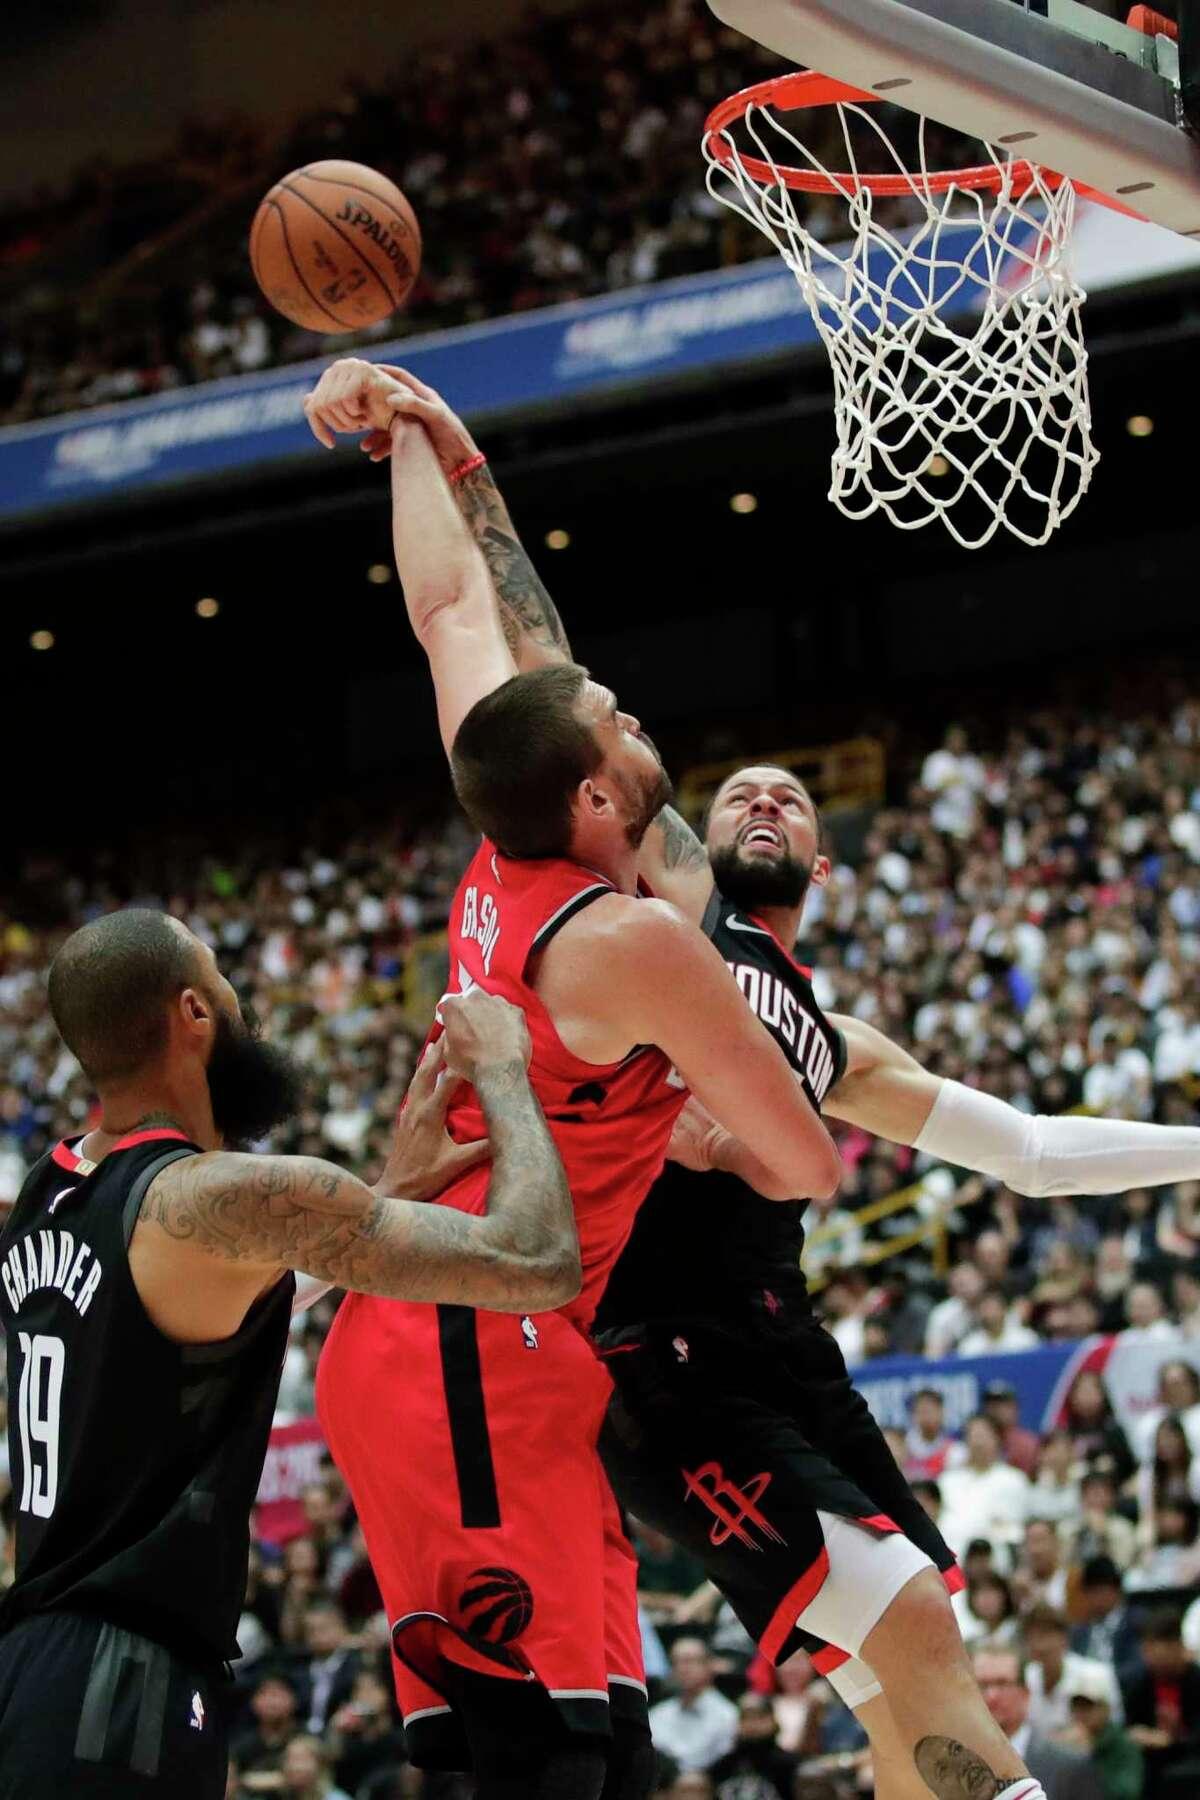 Toronto Raptors' Marc Gasol, center left, is defended by Houston Rockets' Austin Rivers during the first half of an NBA preseason basketball game Thursday, Oct. 10, 2019, in Saitama, near Tokyo. (AP Photo/Jae C. Hong)